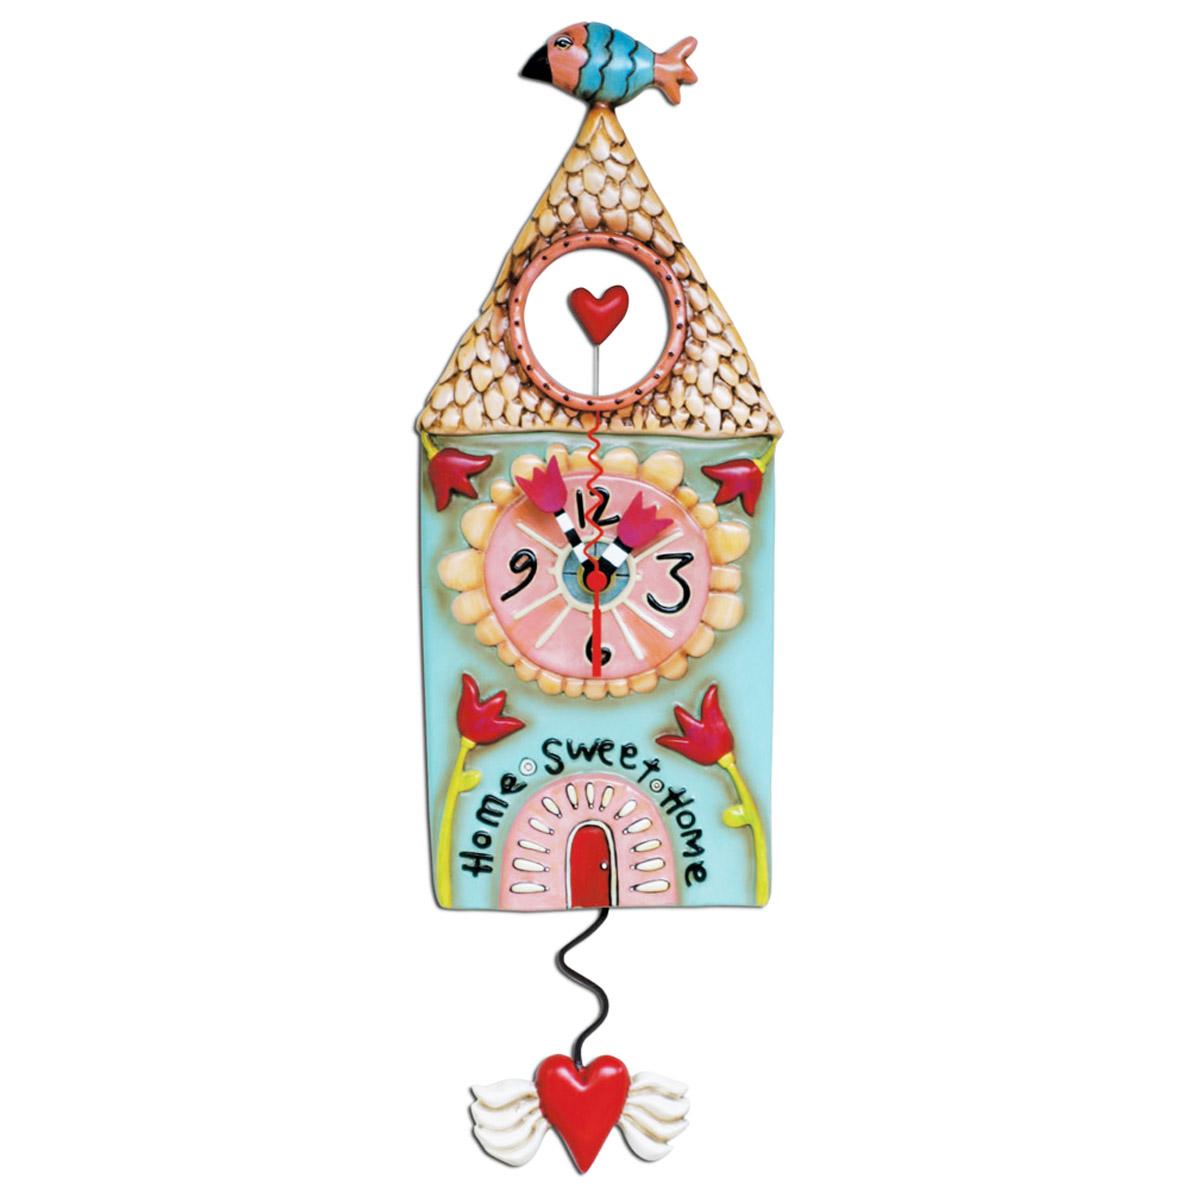 Horloge Murale \'Allen Designs\' multicolore (Home sweet home) - 41x125 cm - [P6181]